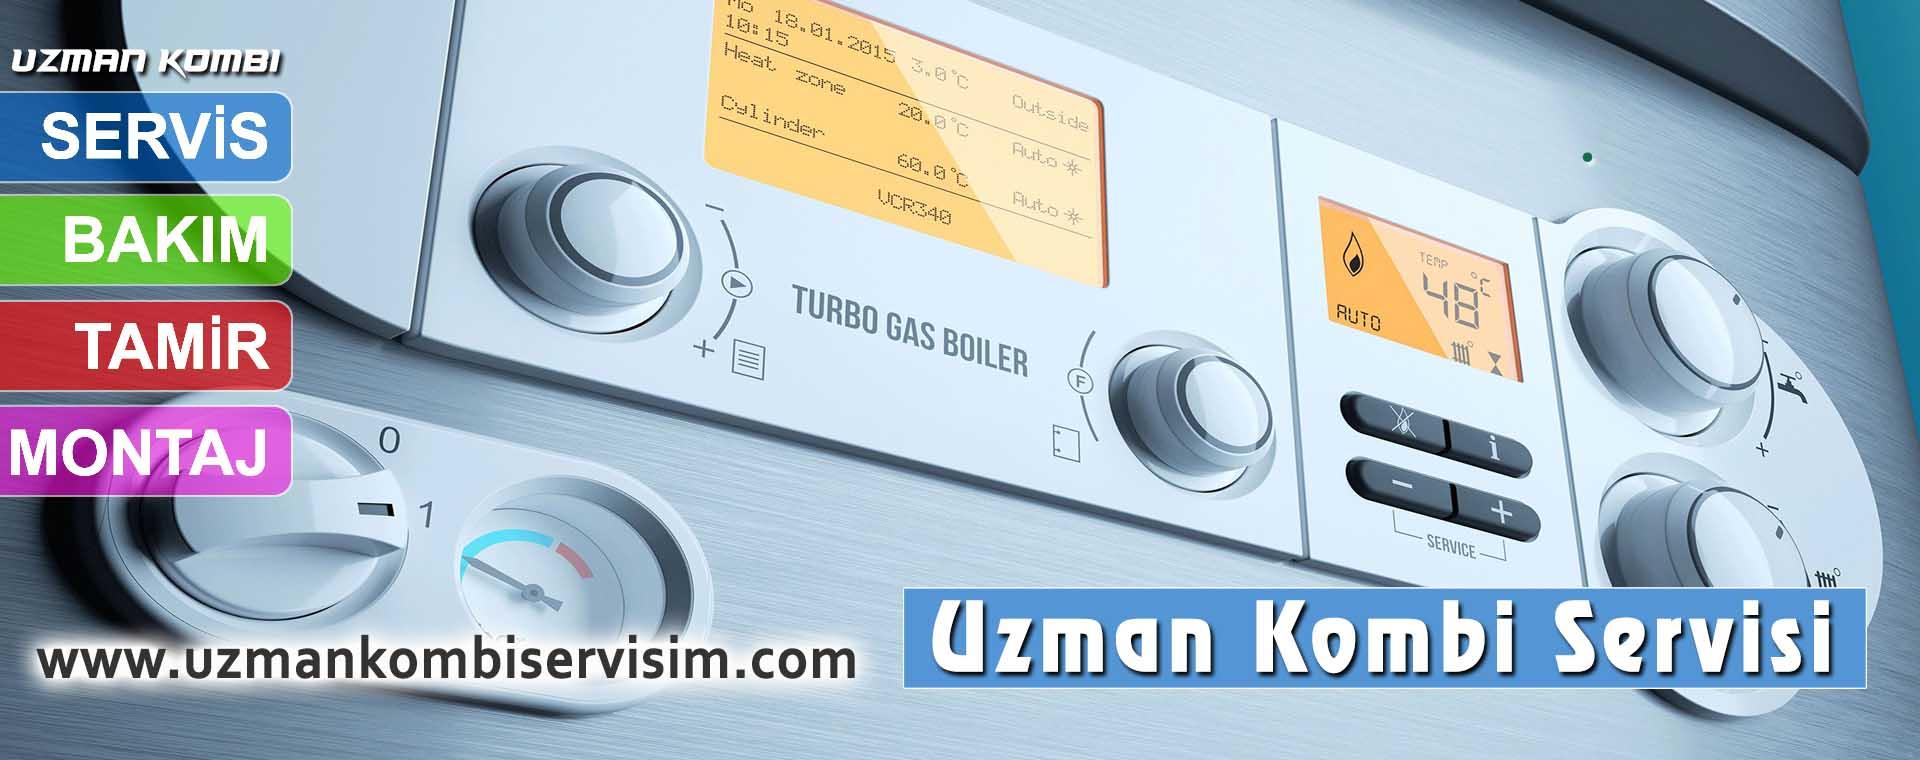 Esat Kombi Servisi Ankara, Esat Uzman Kombi tamiri, kombi bakımı, kombi montajı, petek temizleme, kart tamiri, Esat 7/24 garantili kombi teknik servisi.